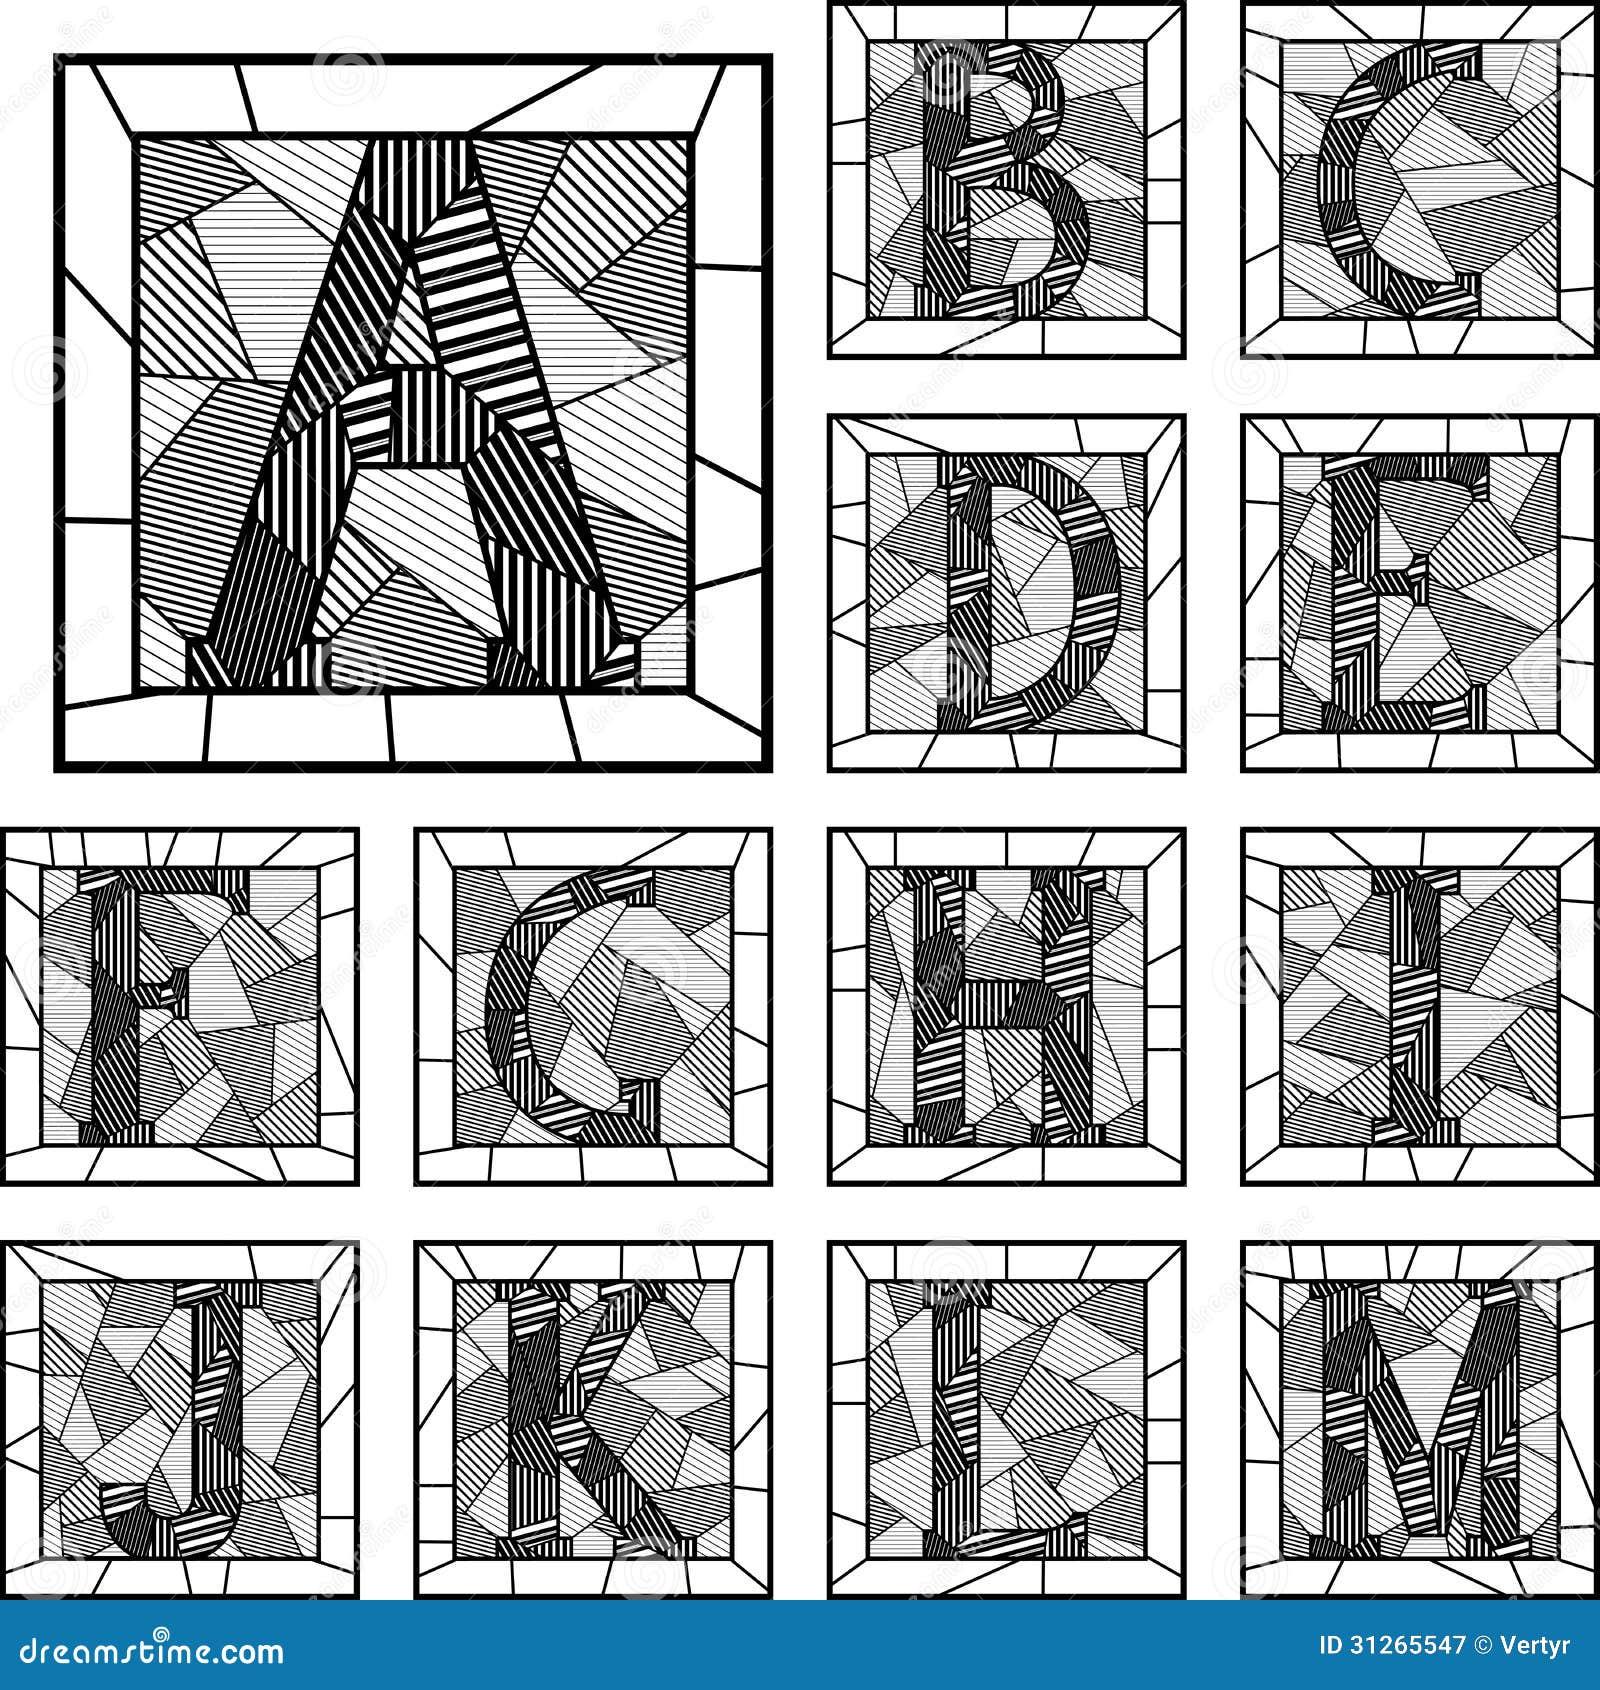 Last Letter Of The Alphabet Z